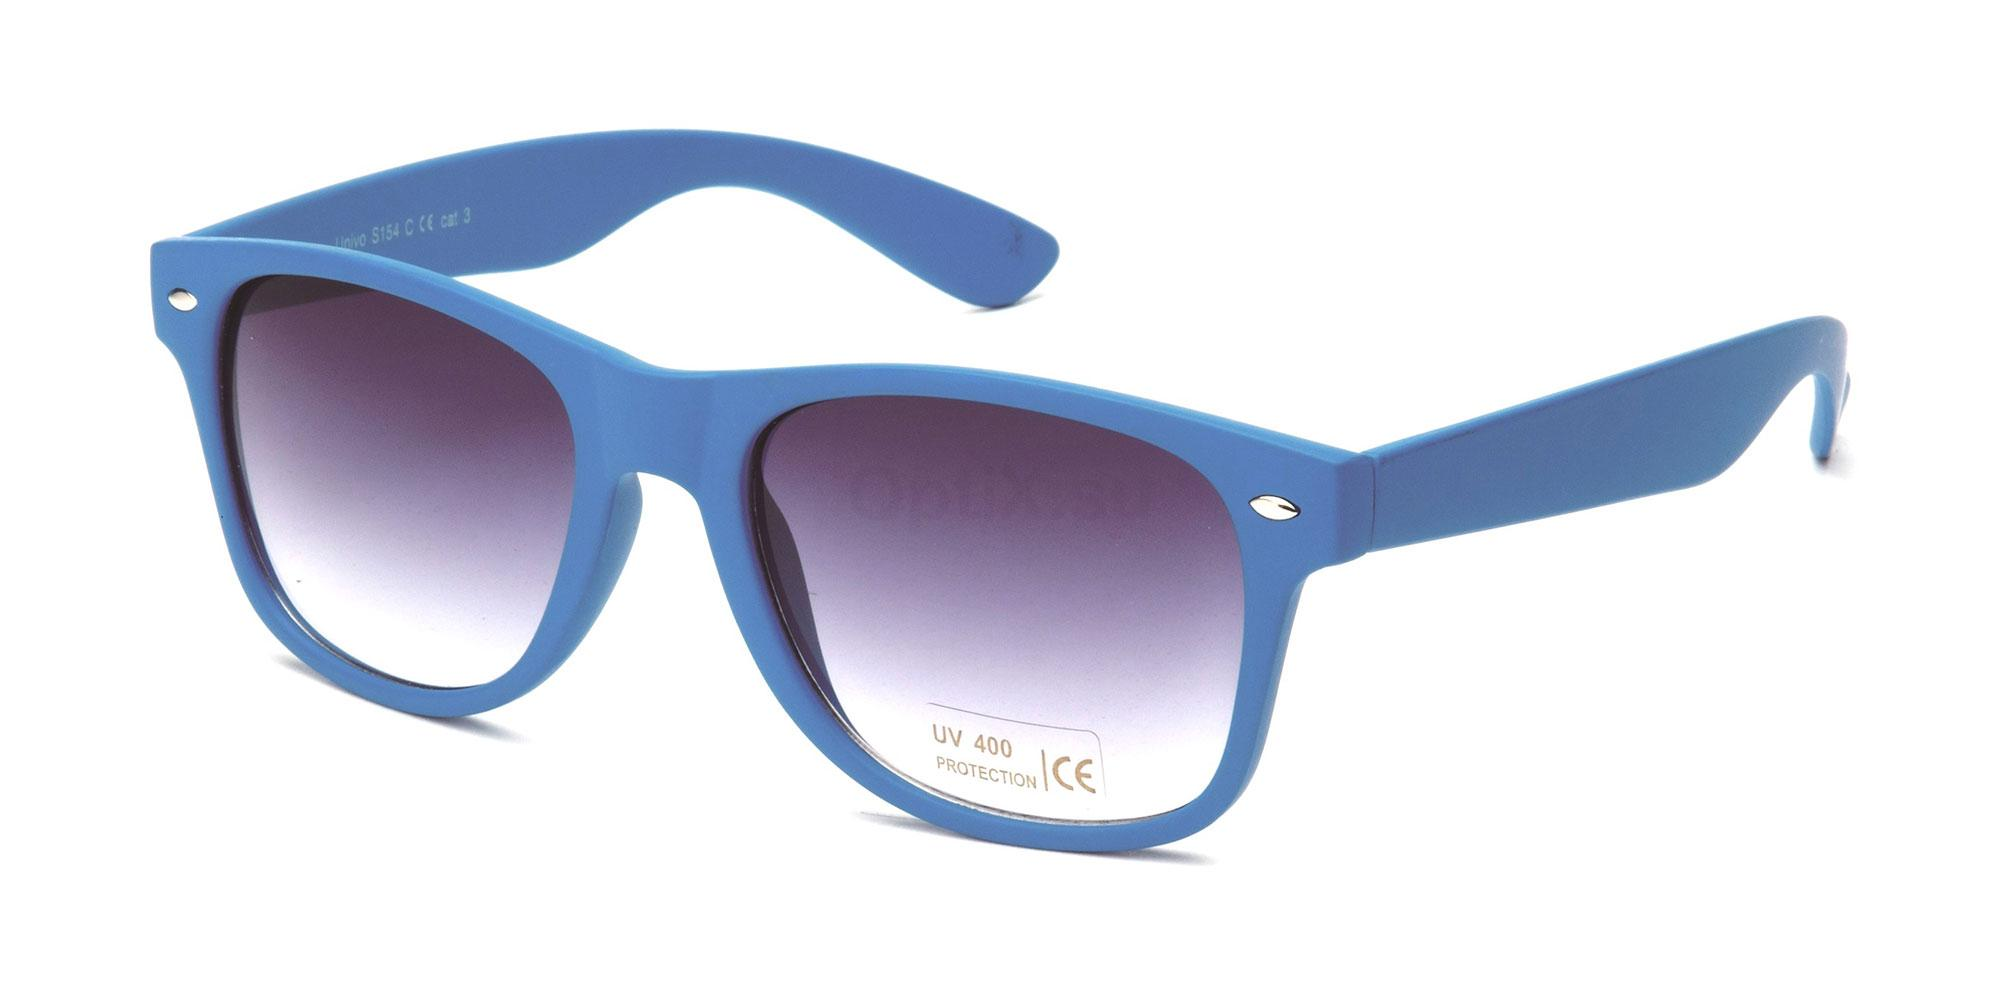 C S154 Sunglasses, Univo